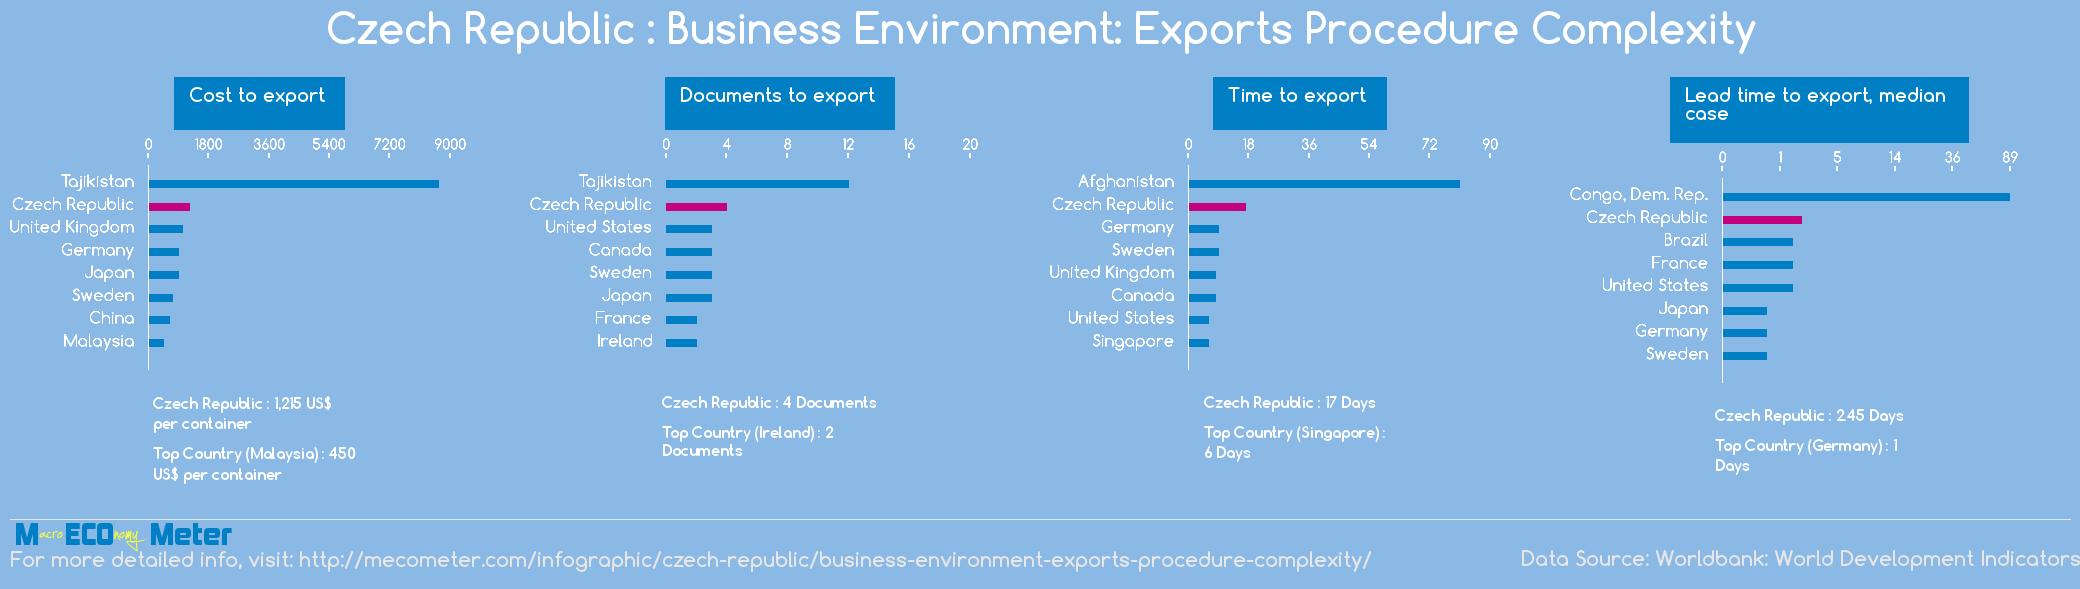 Czech Republic : Business Environment: Exports Procedure Complexity